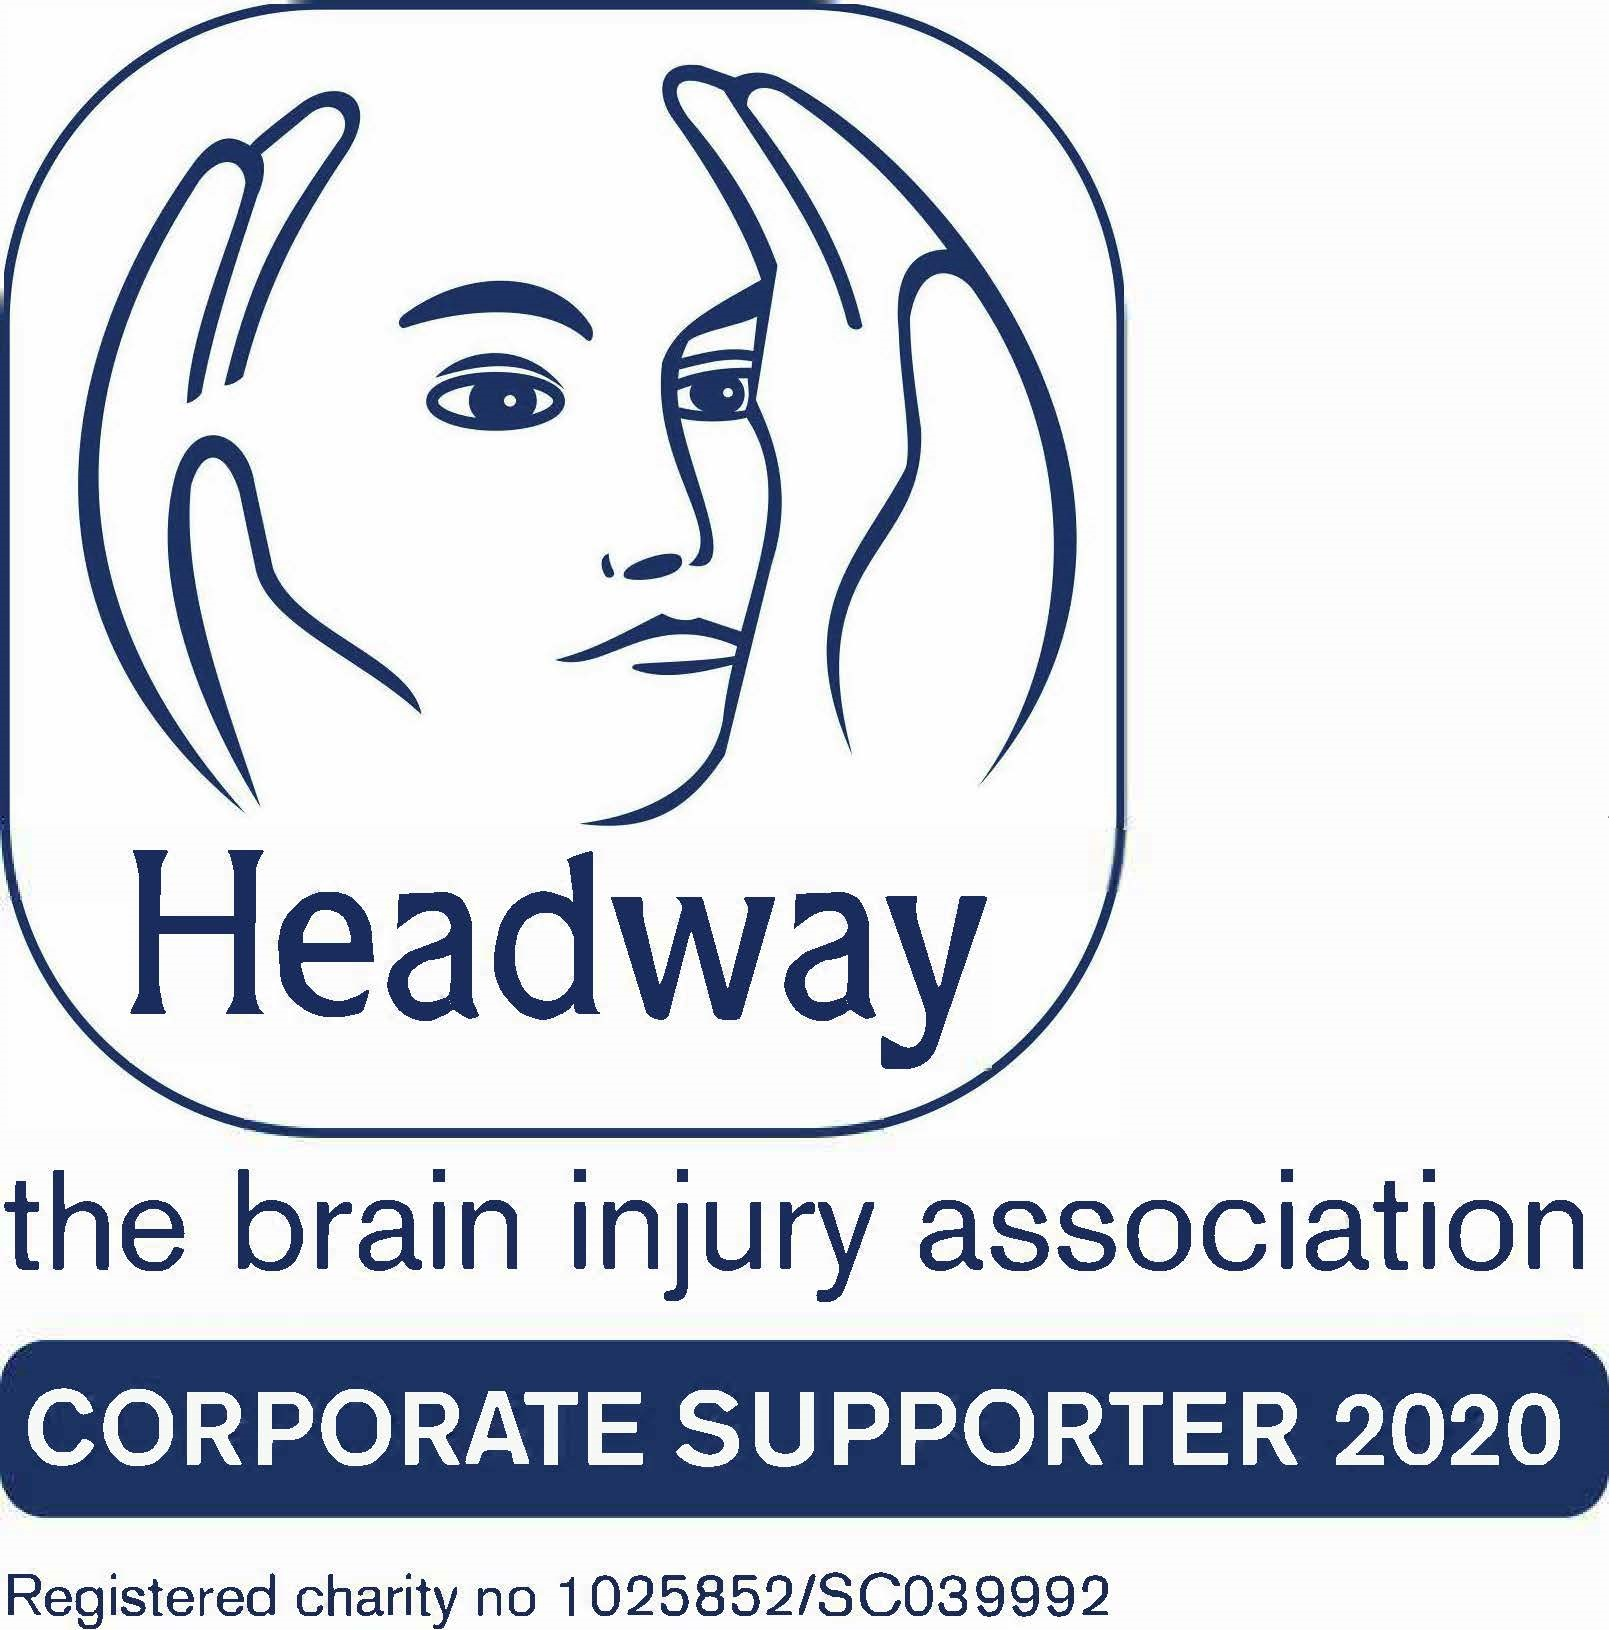 Headway Corporate Member 2020